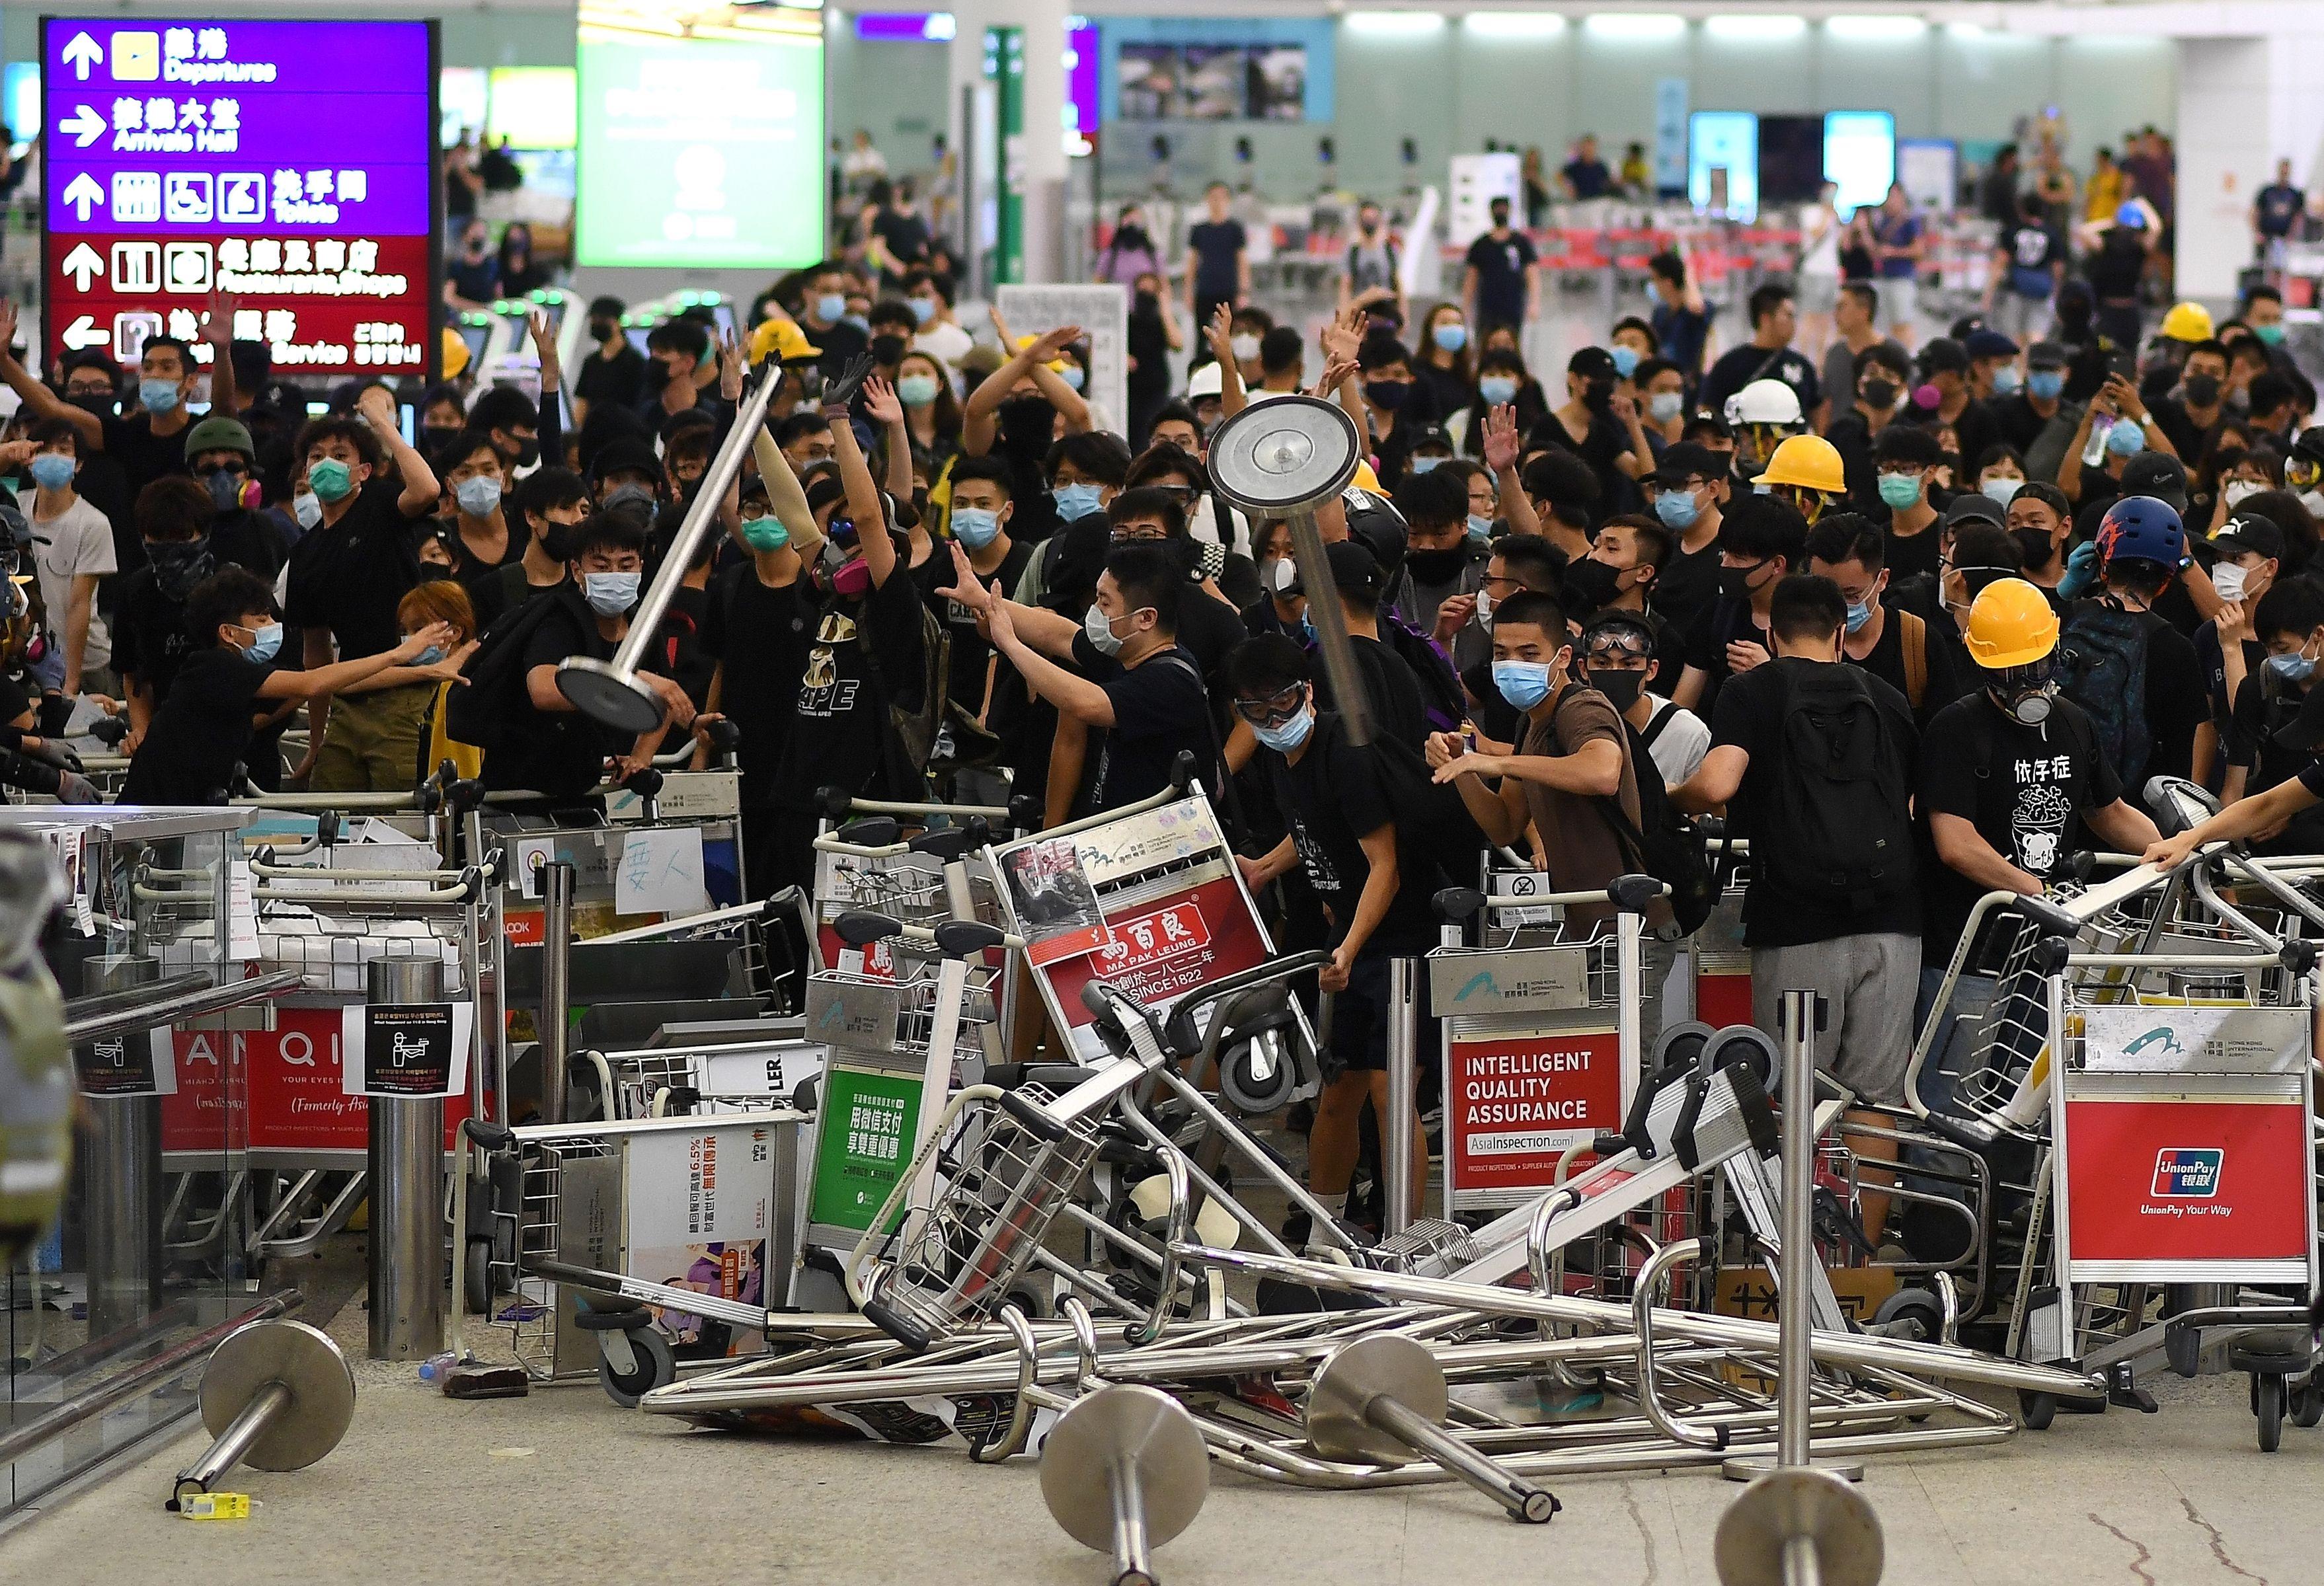 Protestors block the entrance at Hong Kong's international airport on August 13, 2019.